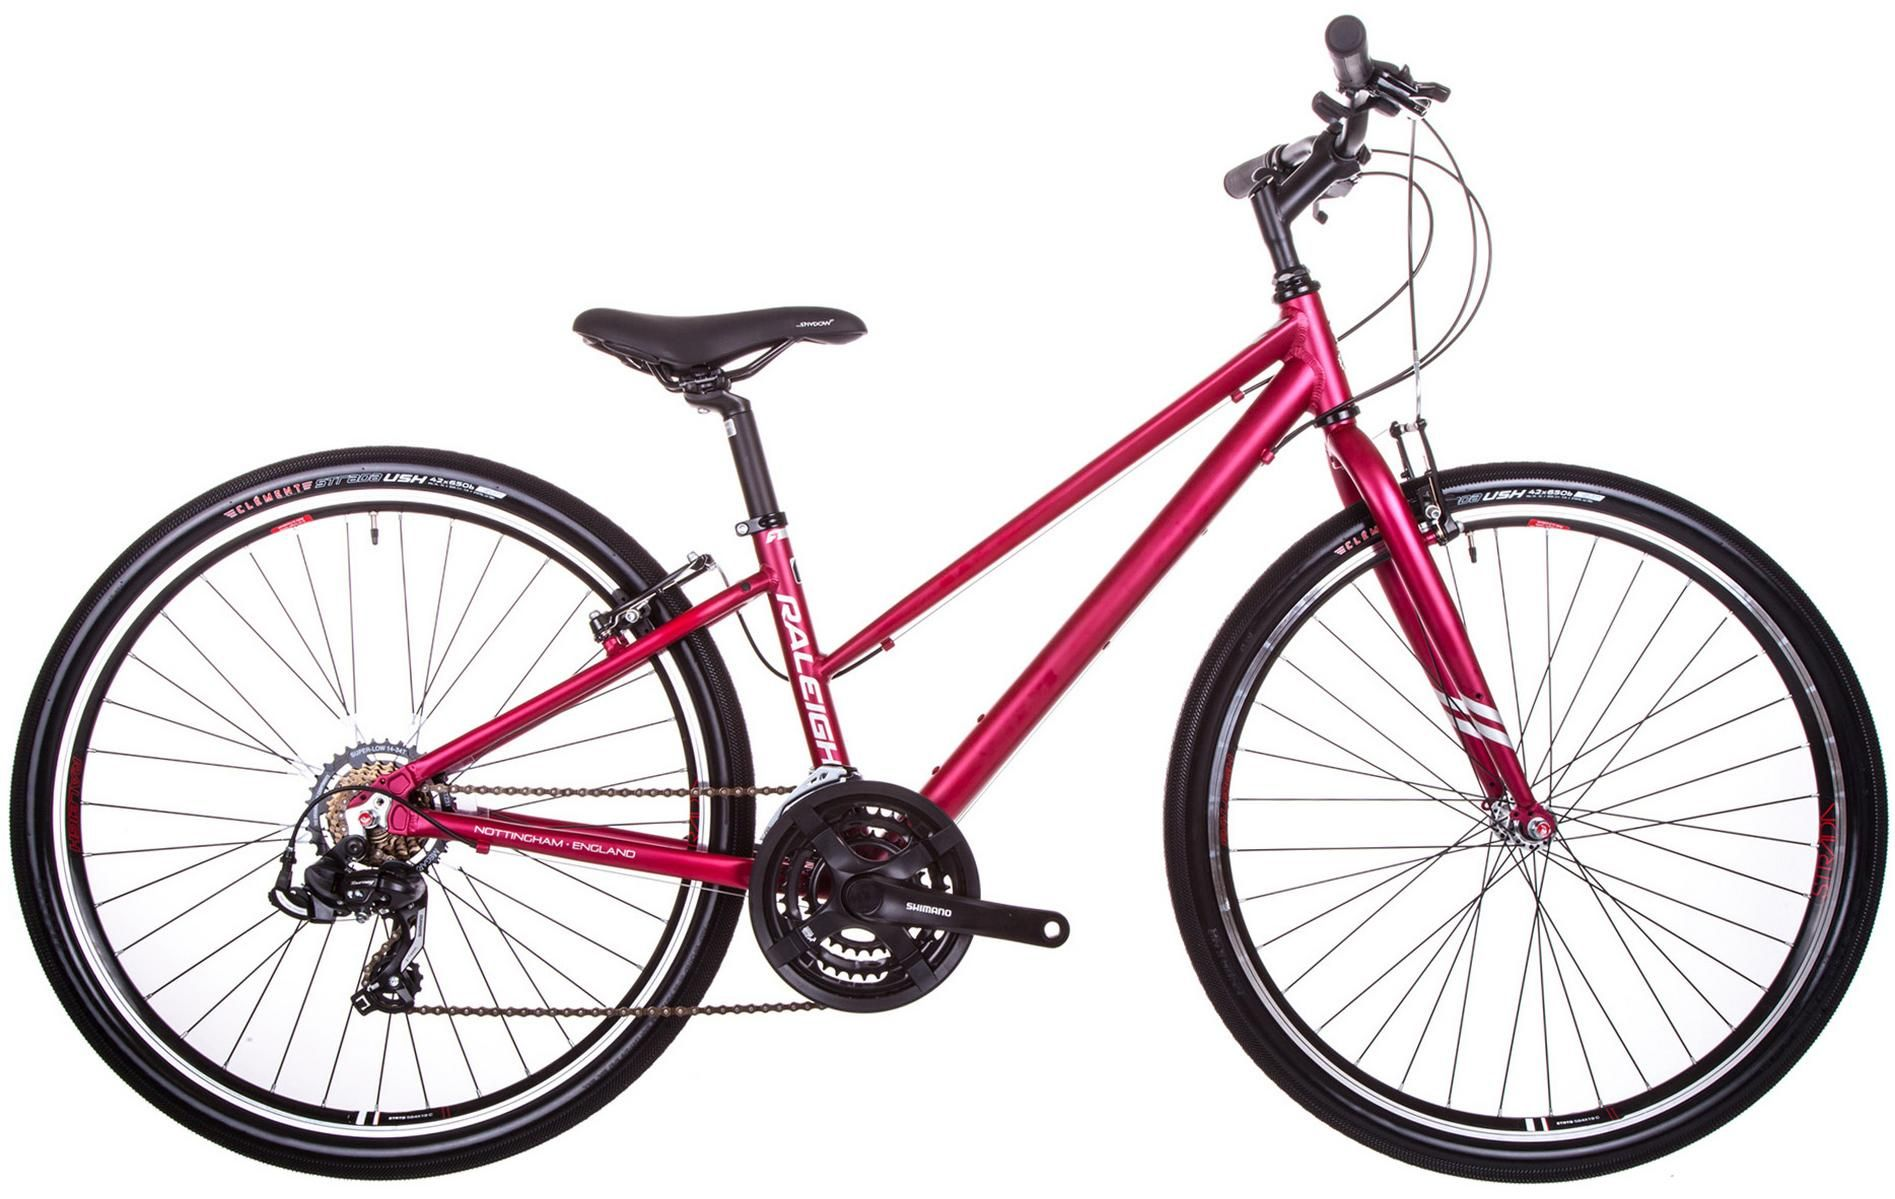 Raleigh Strada 1 Womens Hybrid Bike 14, 17, 19, 21